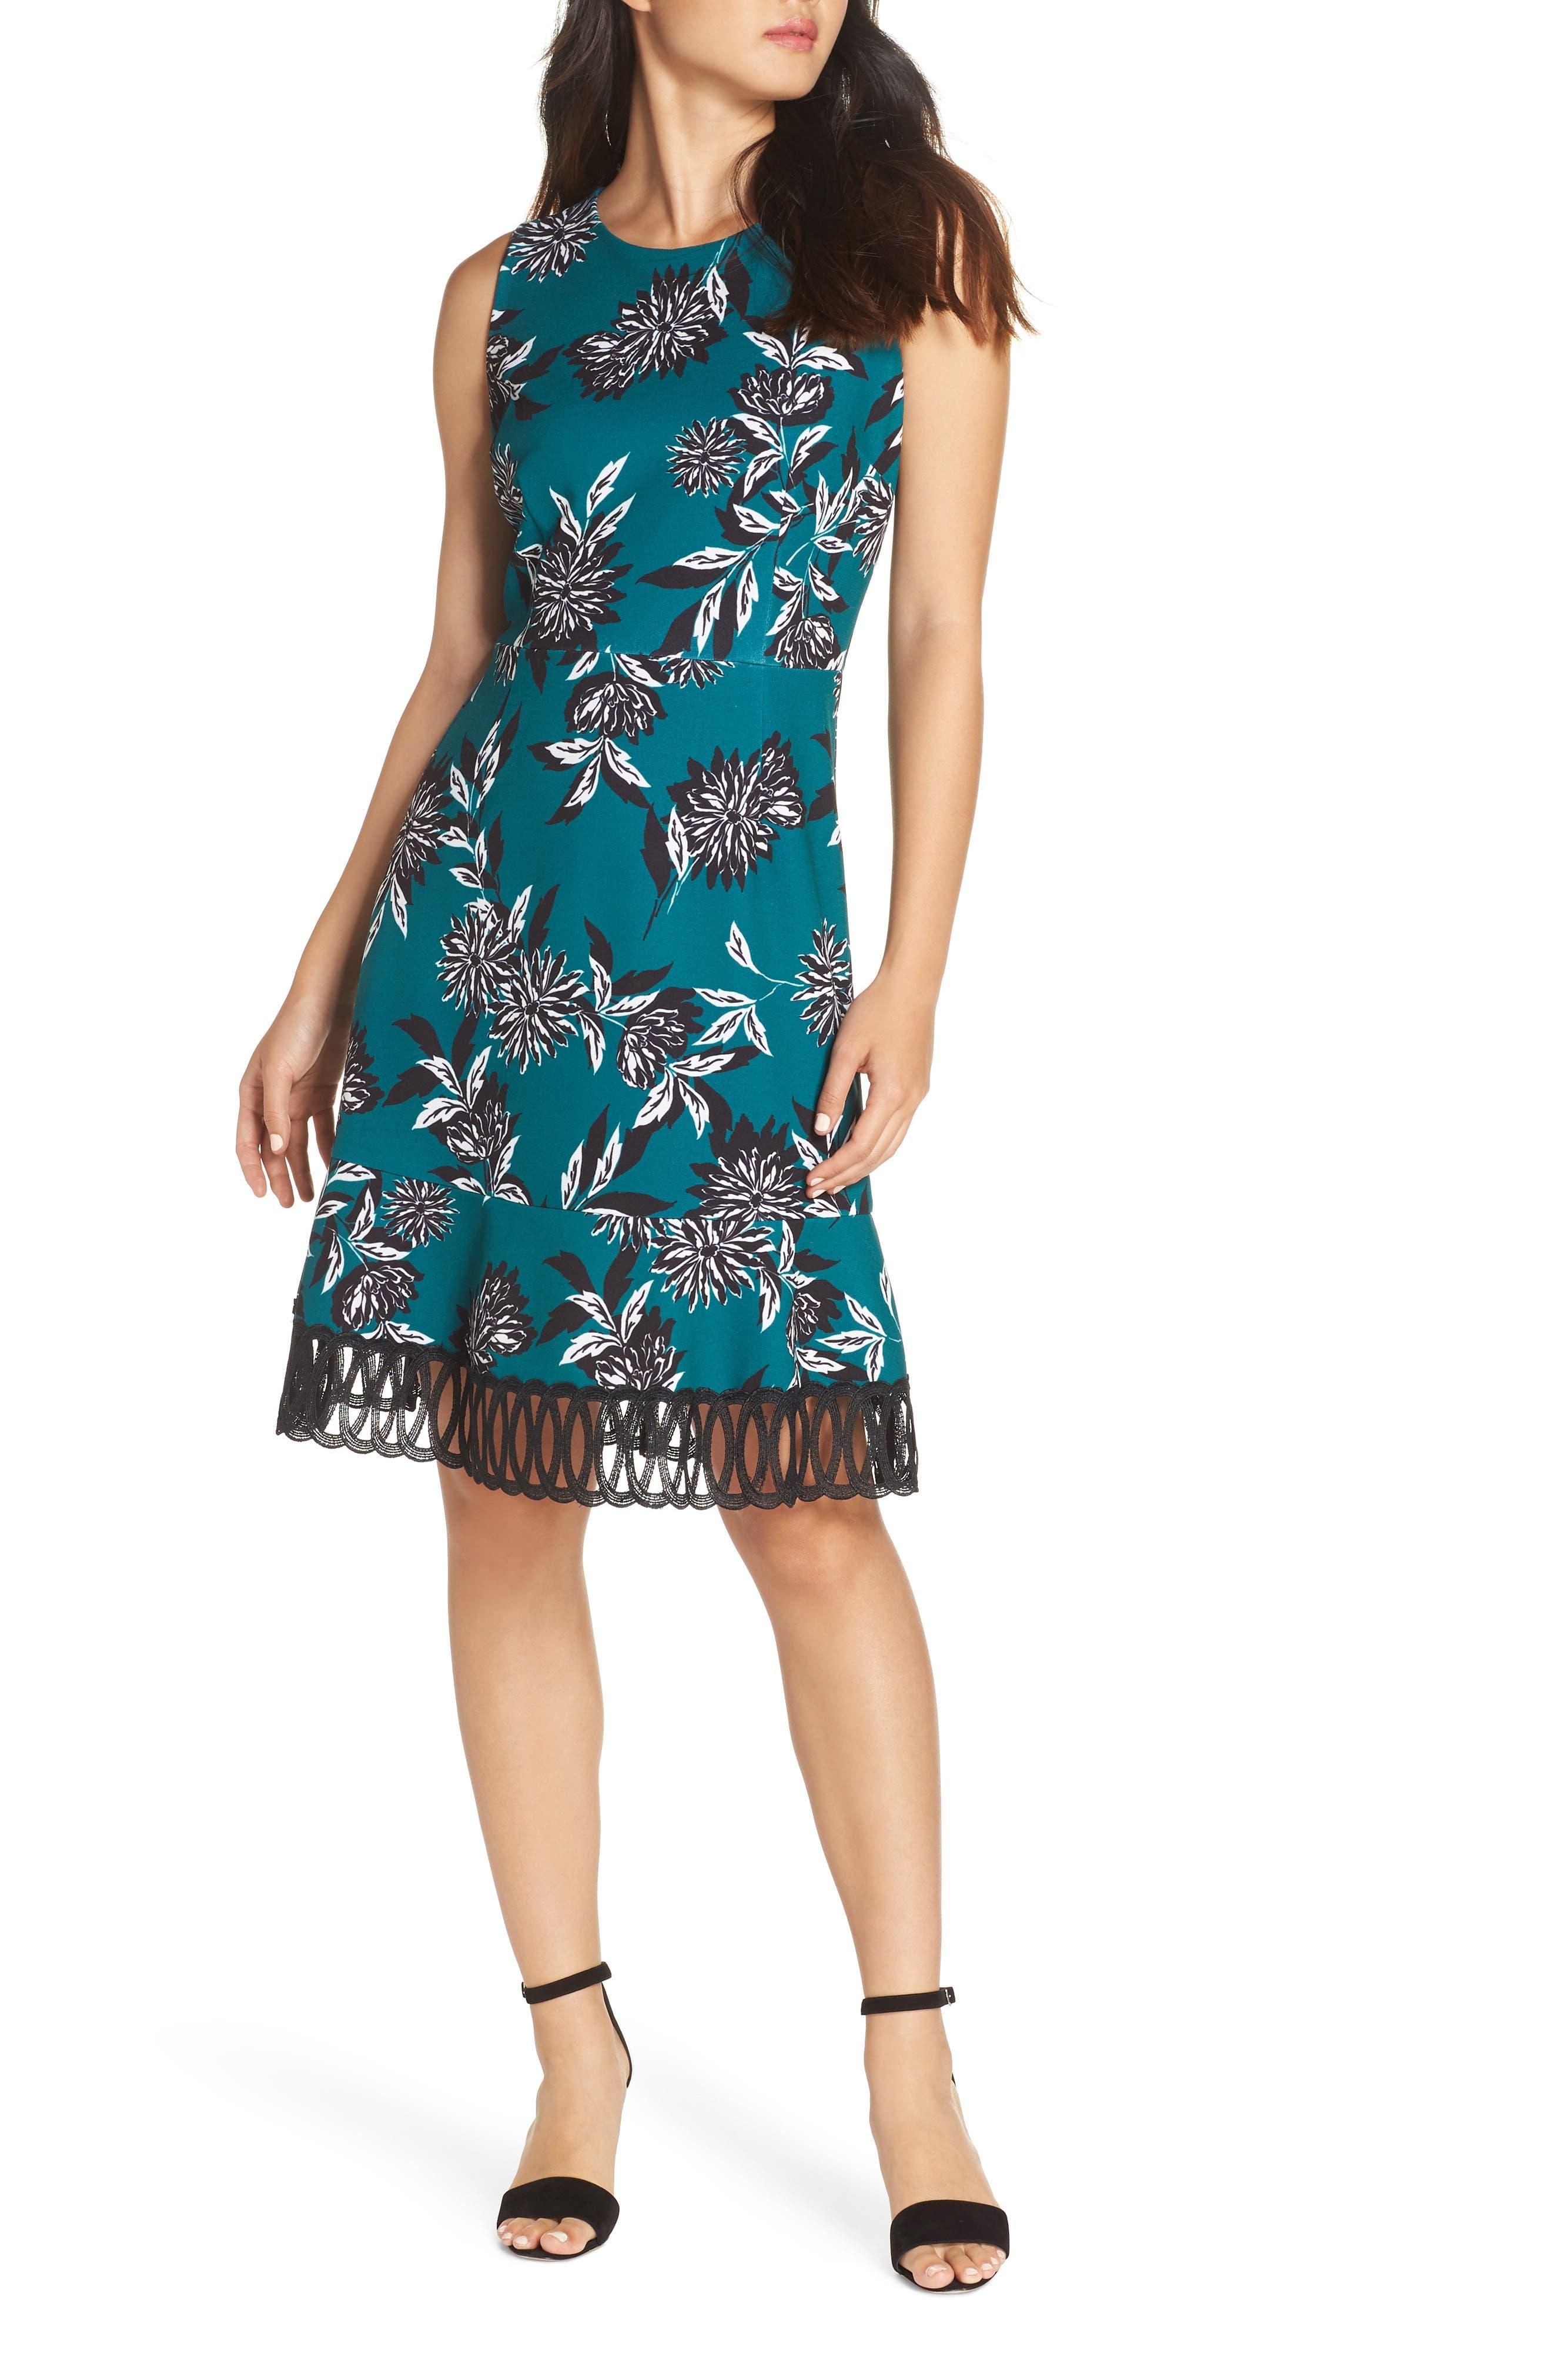 JULIA JORDAN Crepe Scuba A-Line Dress, Main, color, 300